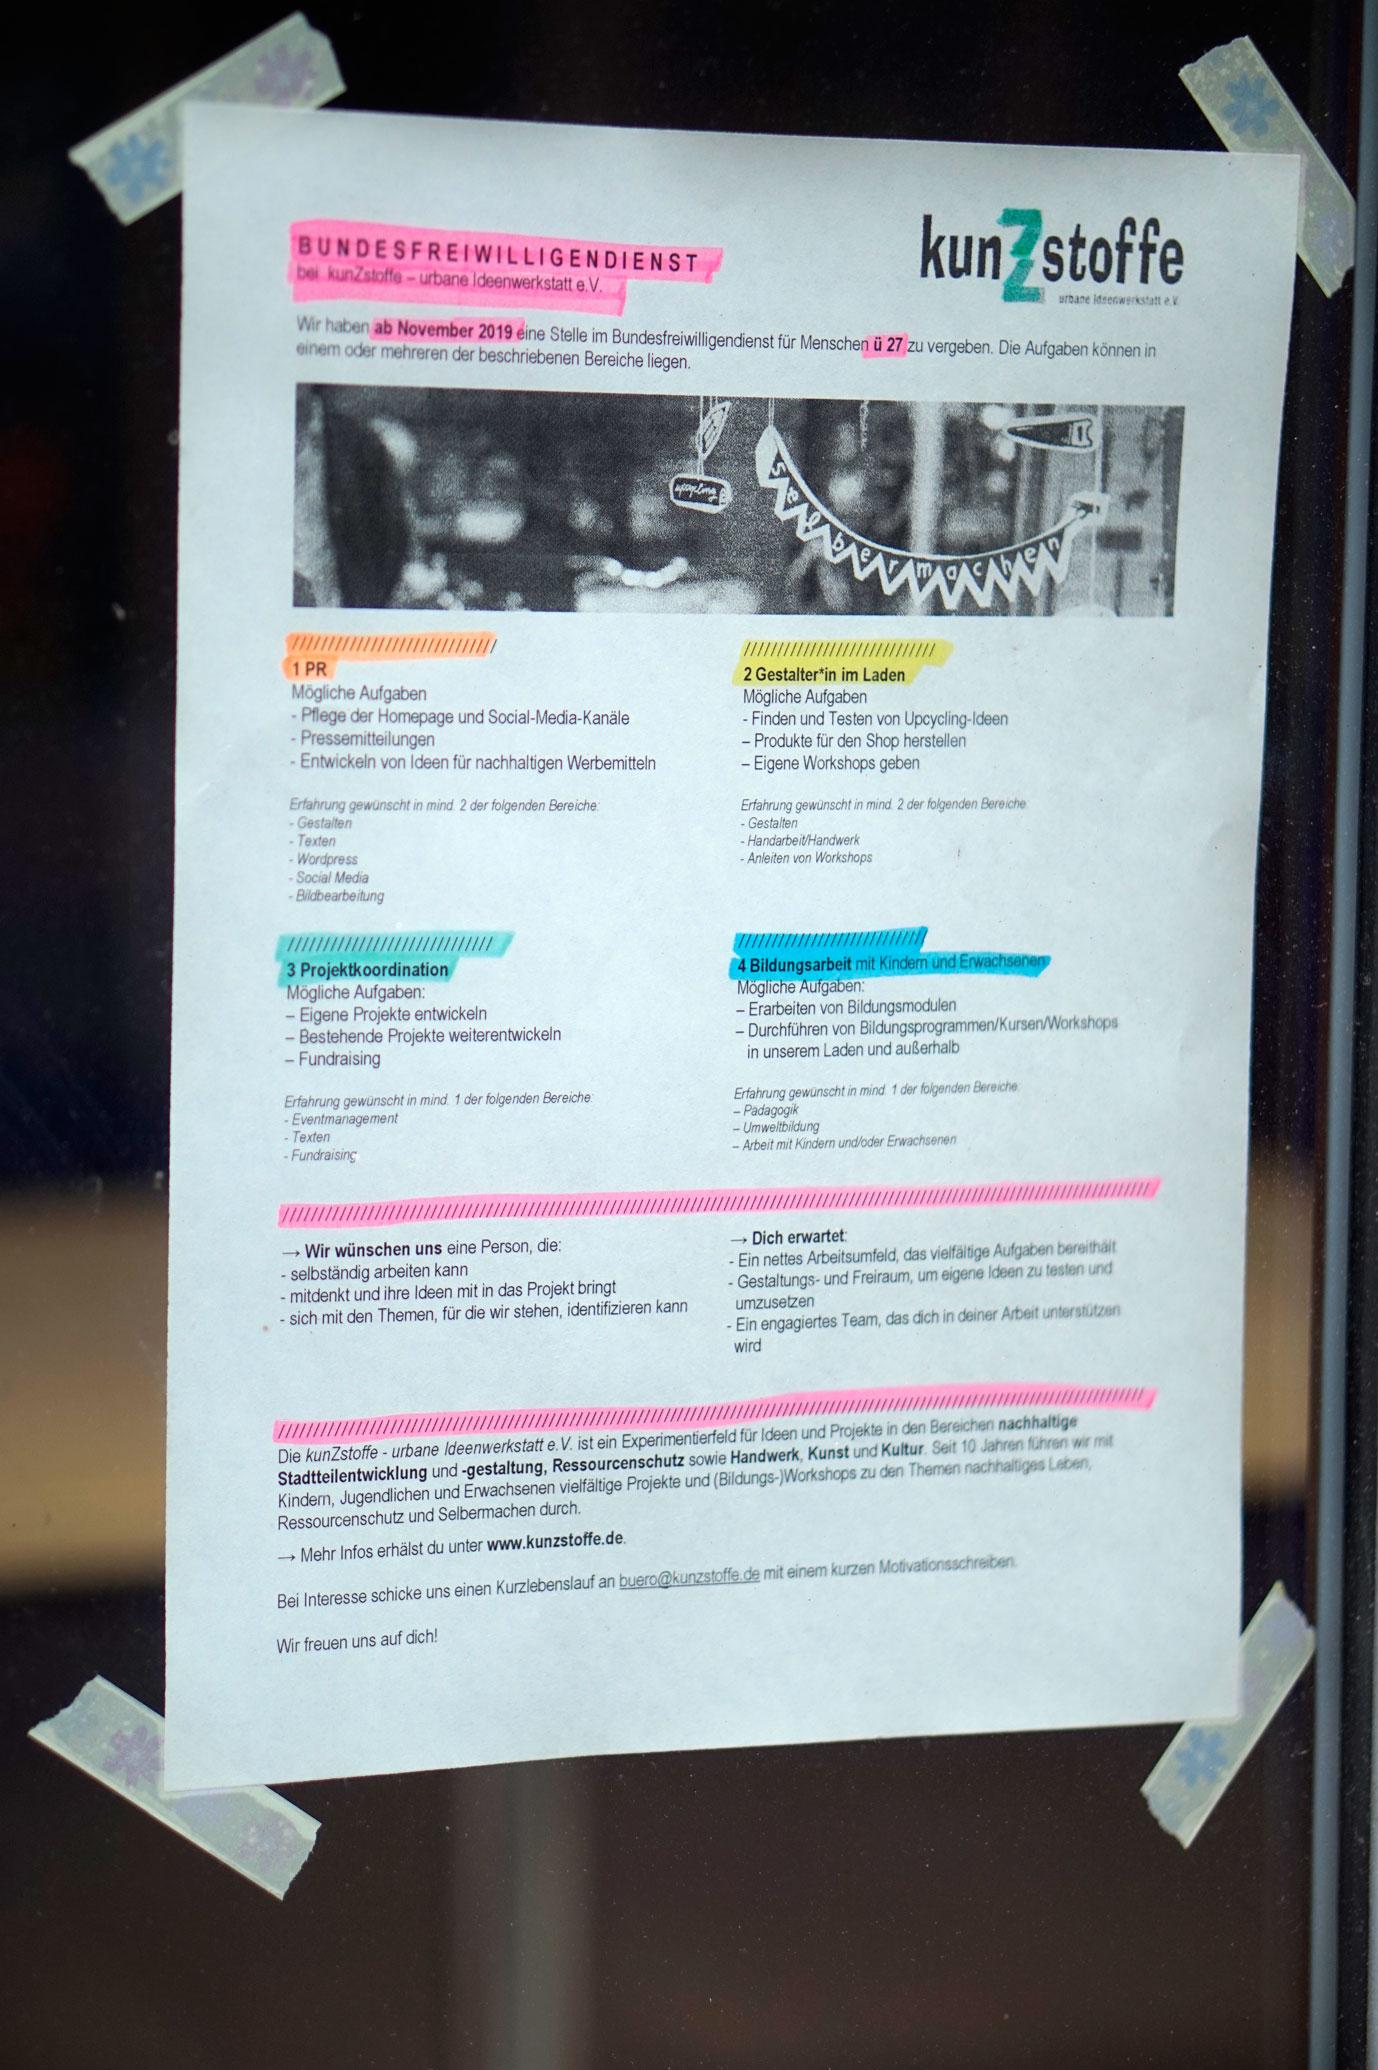 BUFDI bei kunZstoffe – urbane Ideenwerkstatt e.V.